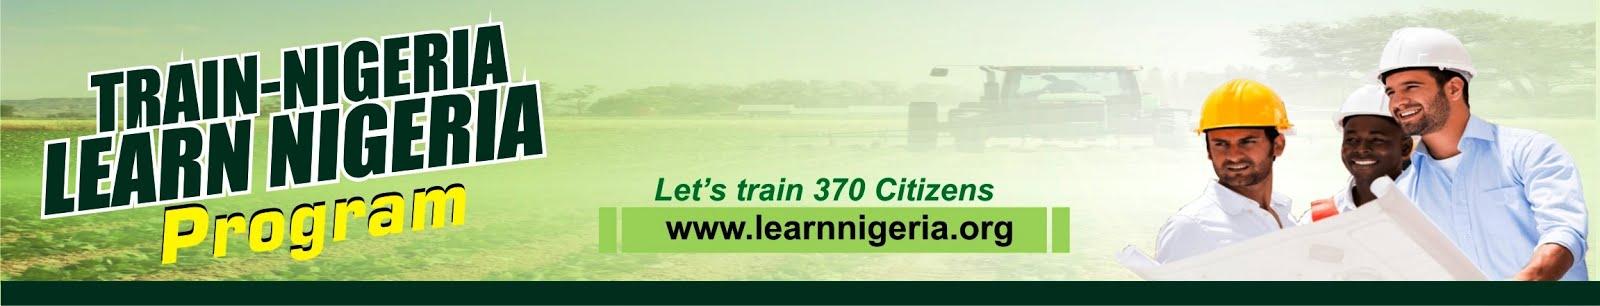 TRAIN - NIGERIA 2018